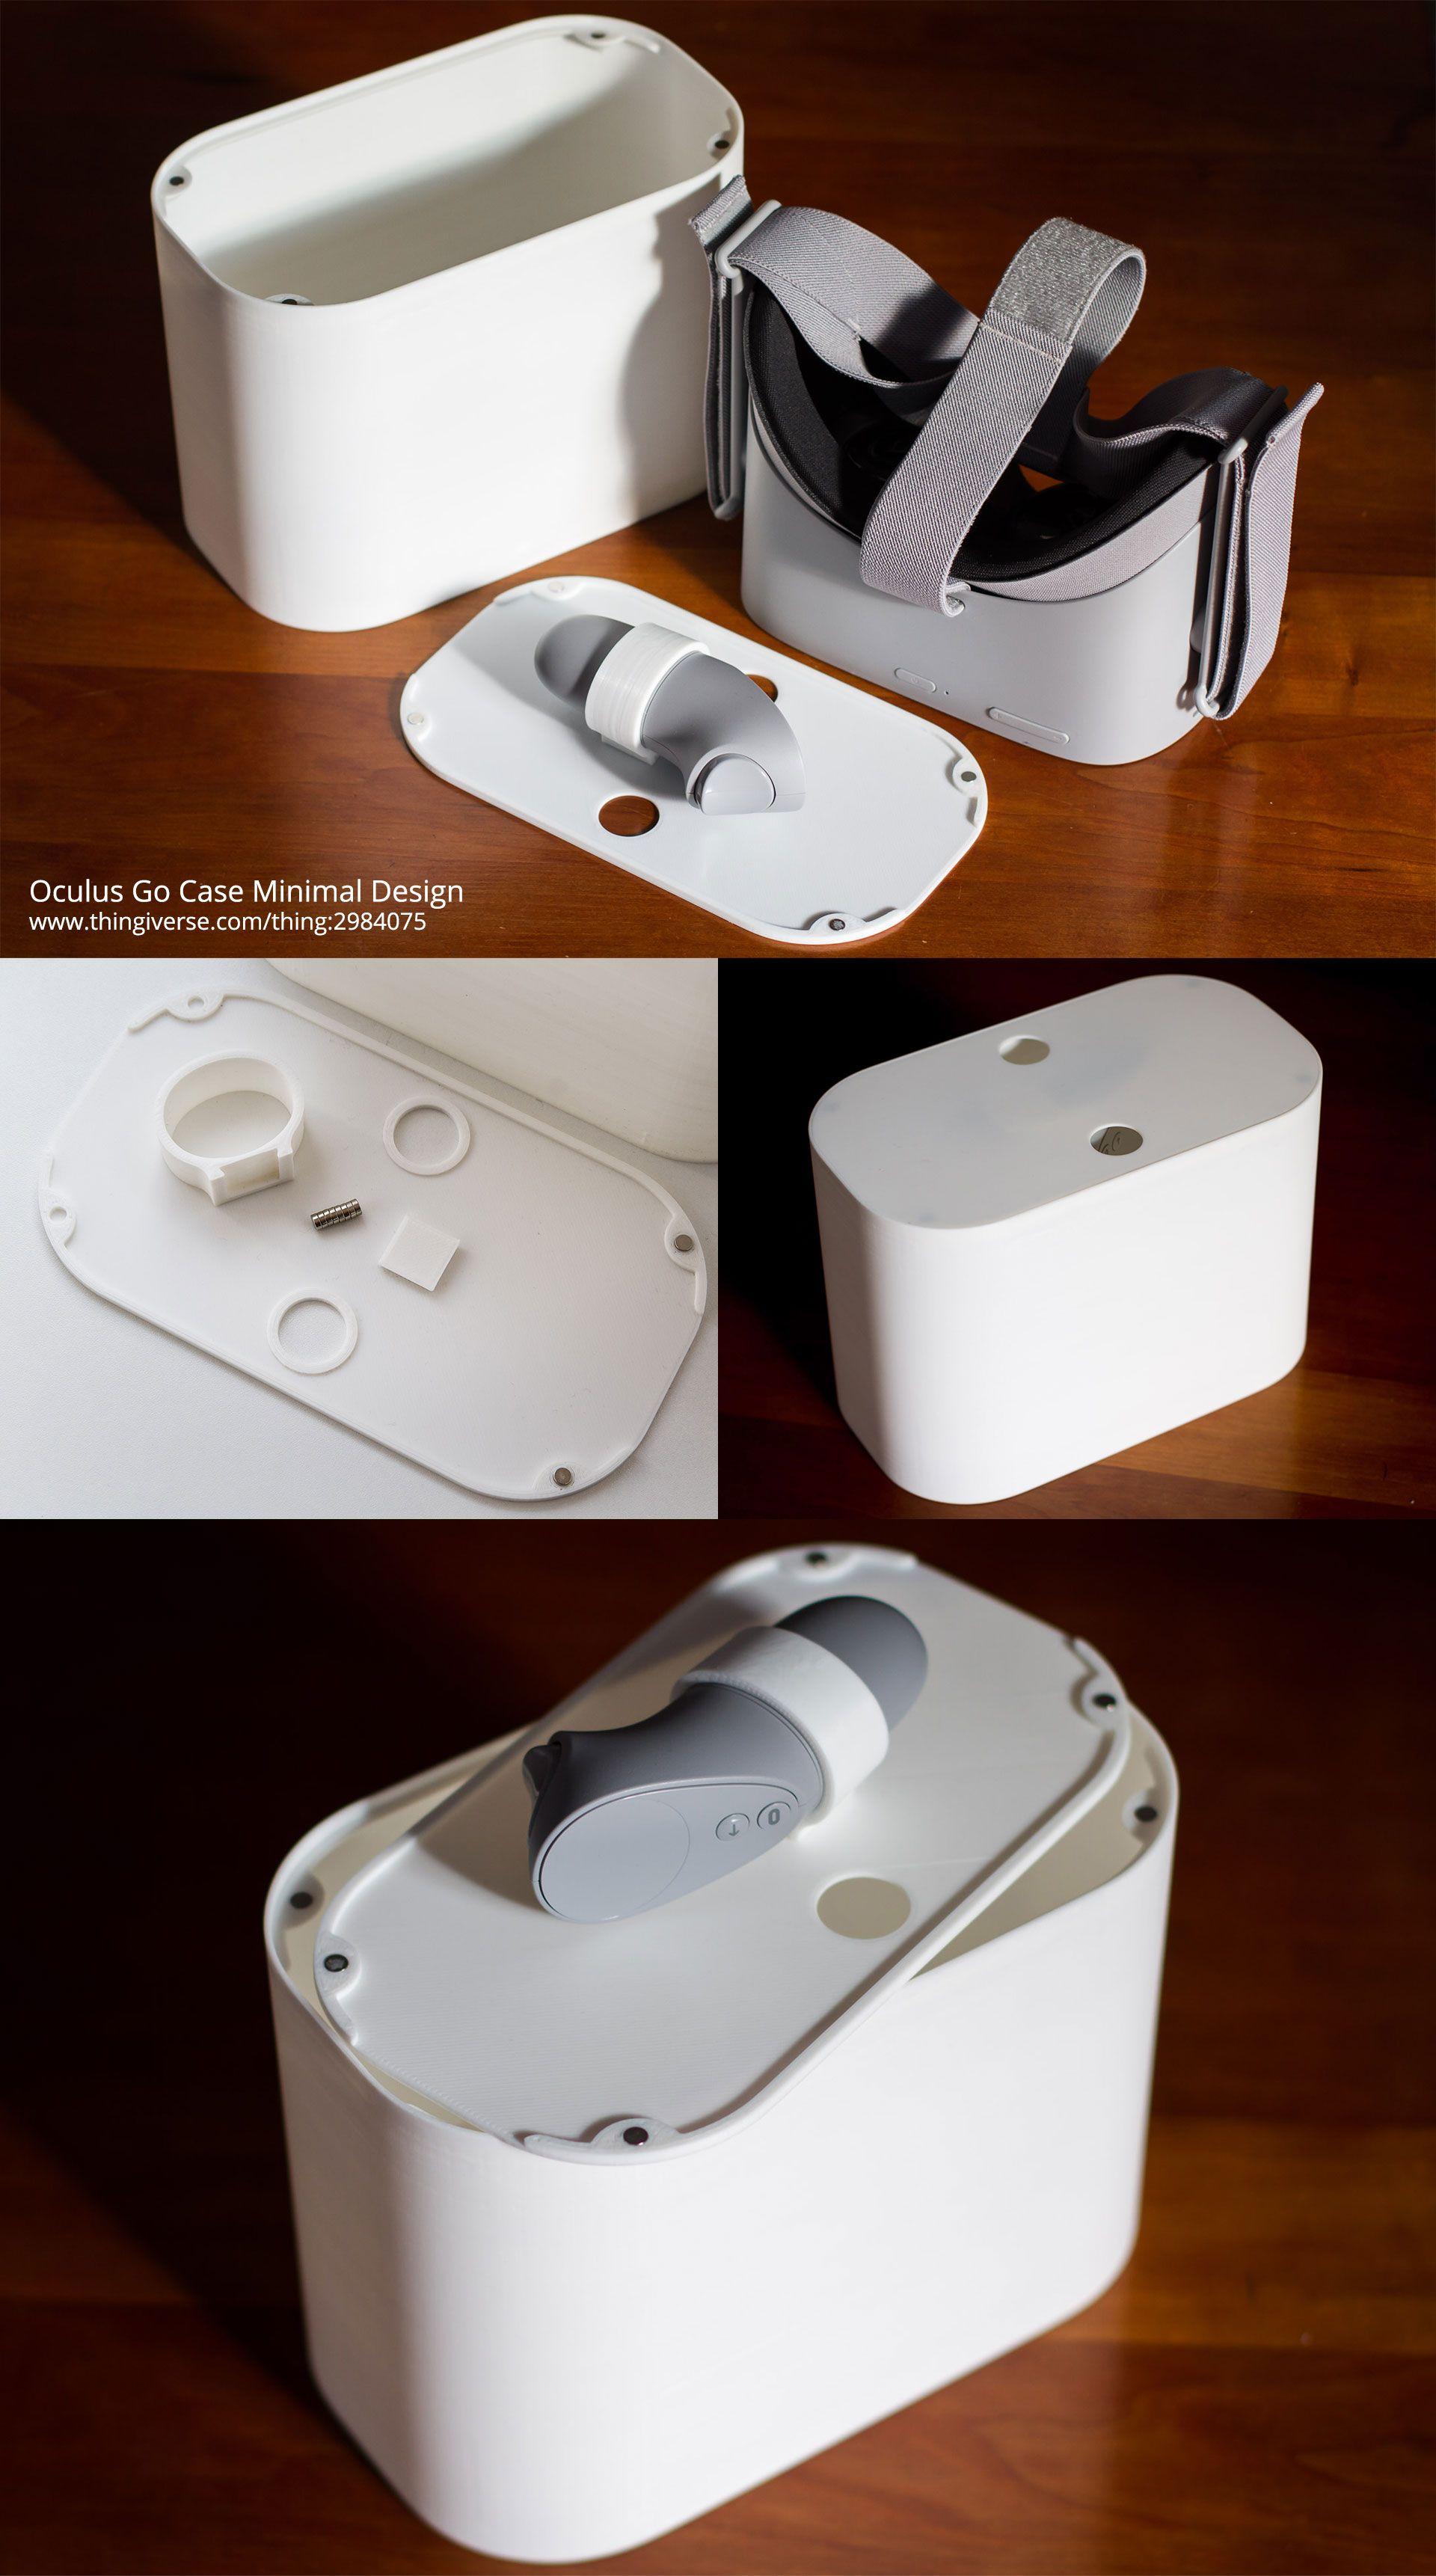 Oculus Go Case Minimal Design A 3D printed travel case for the